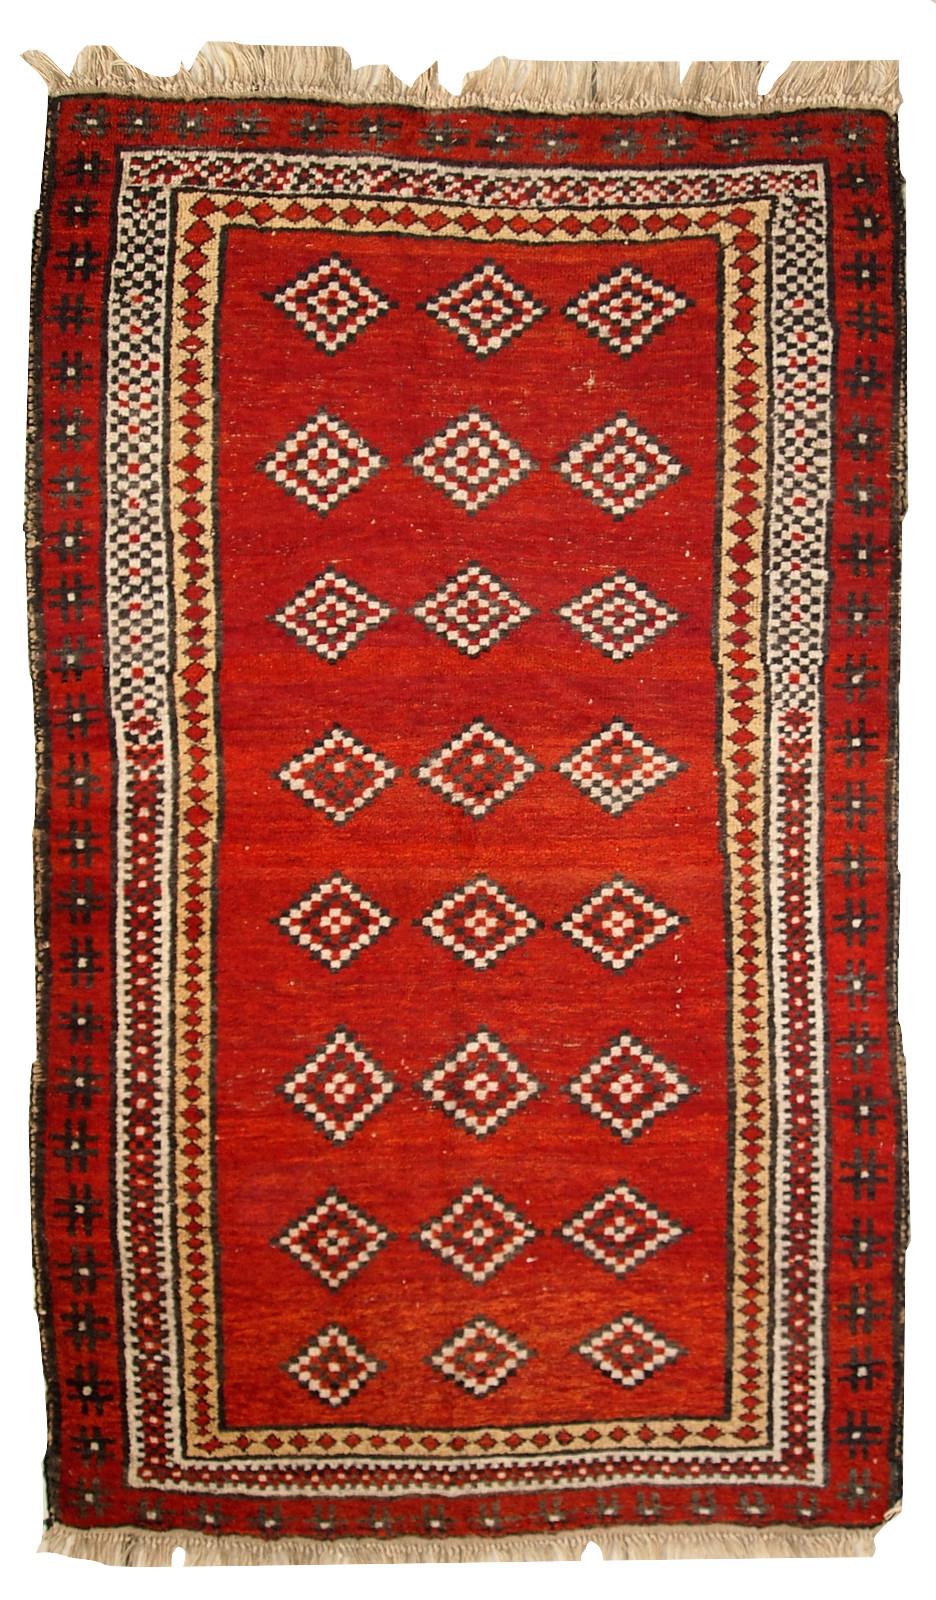 Handmade Antique Uzbek Gulyam Rug